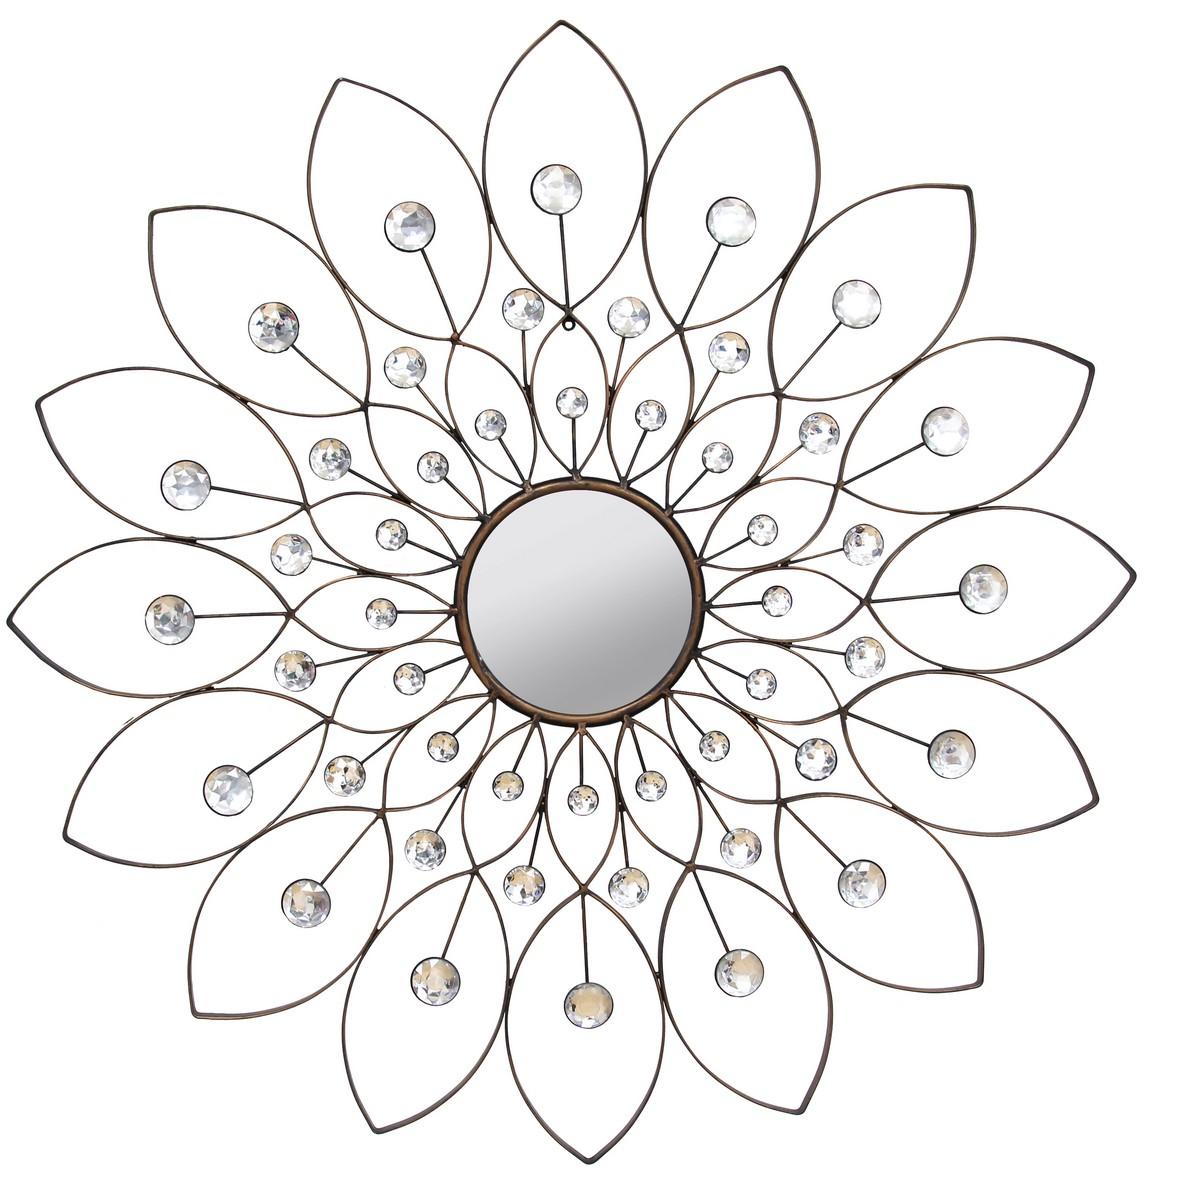 Stratton Home Decor Decorative Flower Mirror - Black